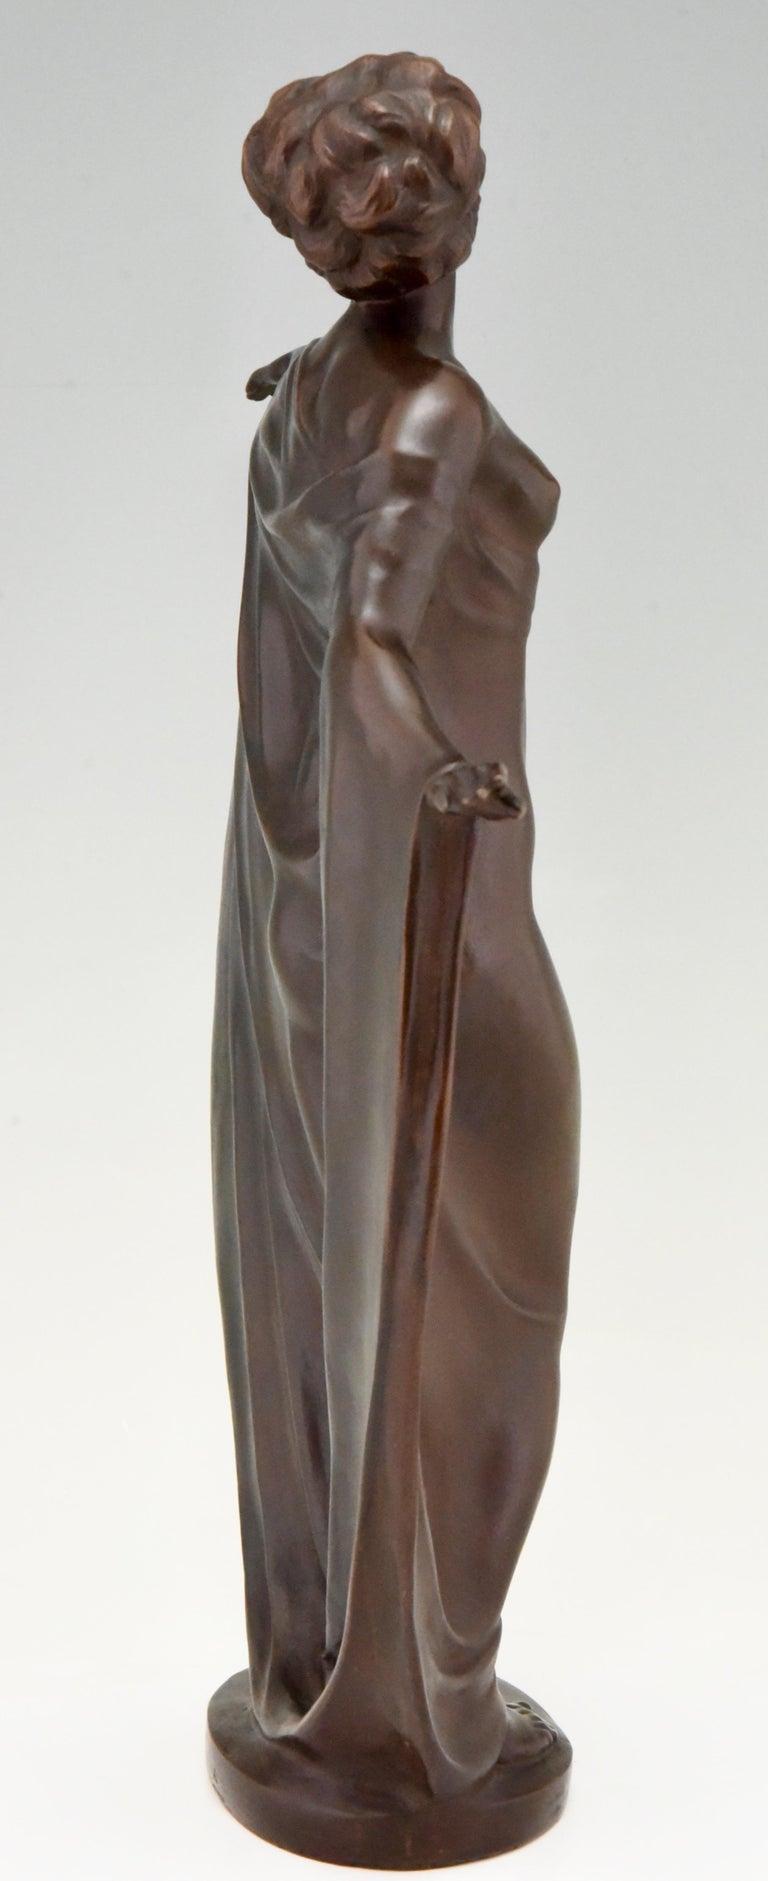 Early 20th Century Art Nouveau Vienna Bronze Sculpture Draped Nude Dancer Theodor Stundl, 1910 For Sale